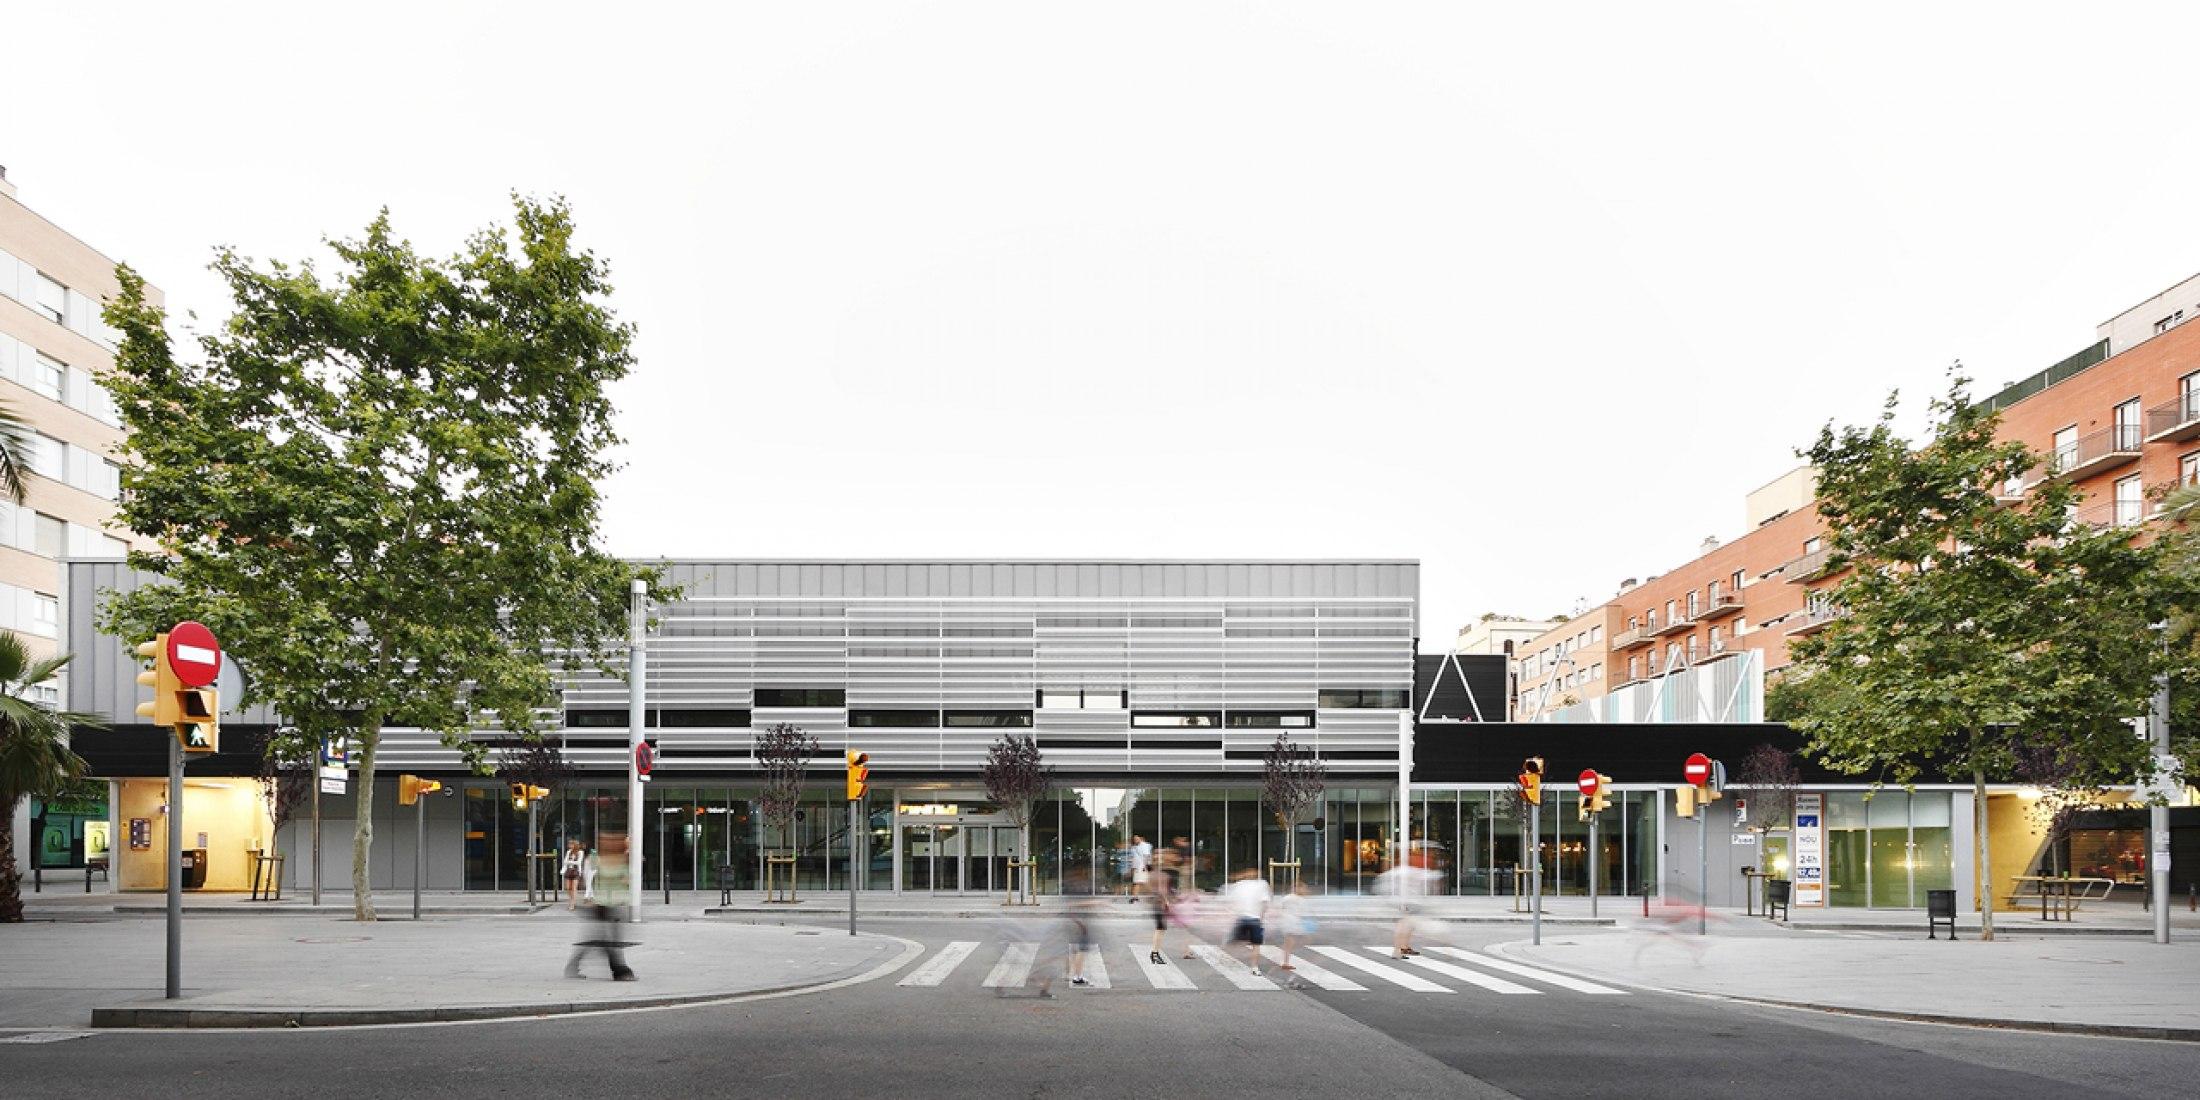 View of the surroundings. Public multifunctional building in Sant Martí by SUMO Arquitectes + Yolanda Olmo. Photograph © Aitor Estévez.